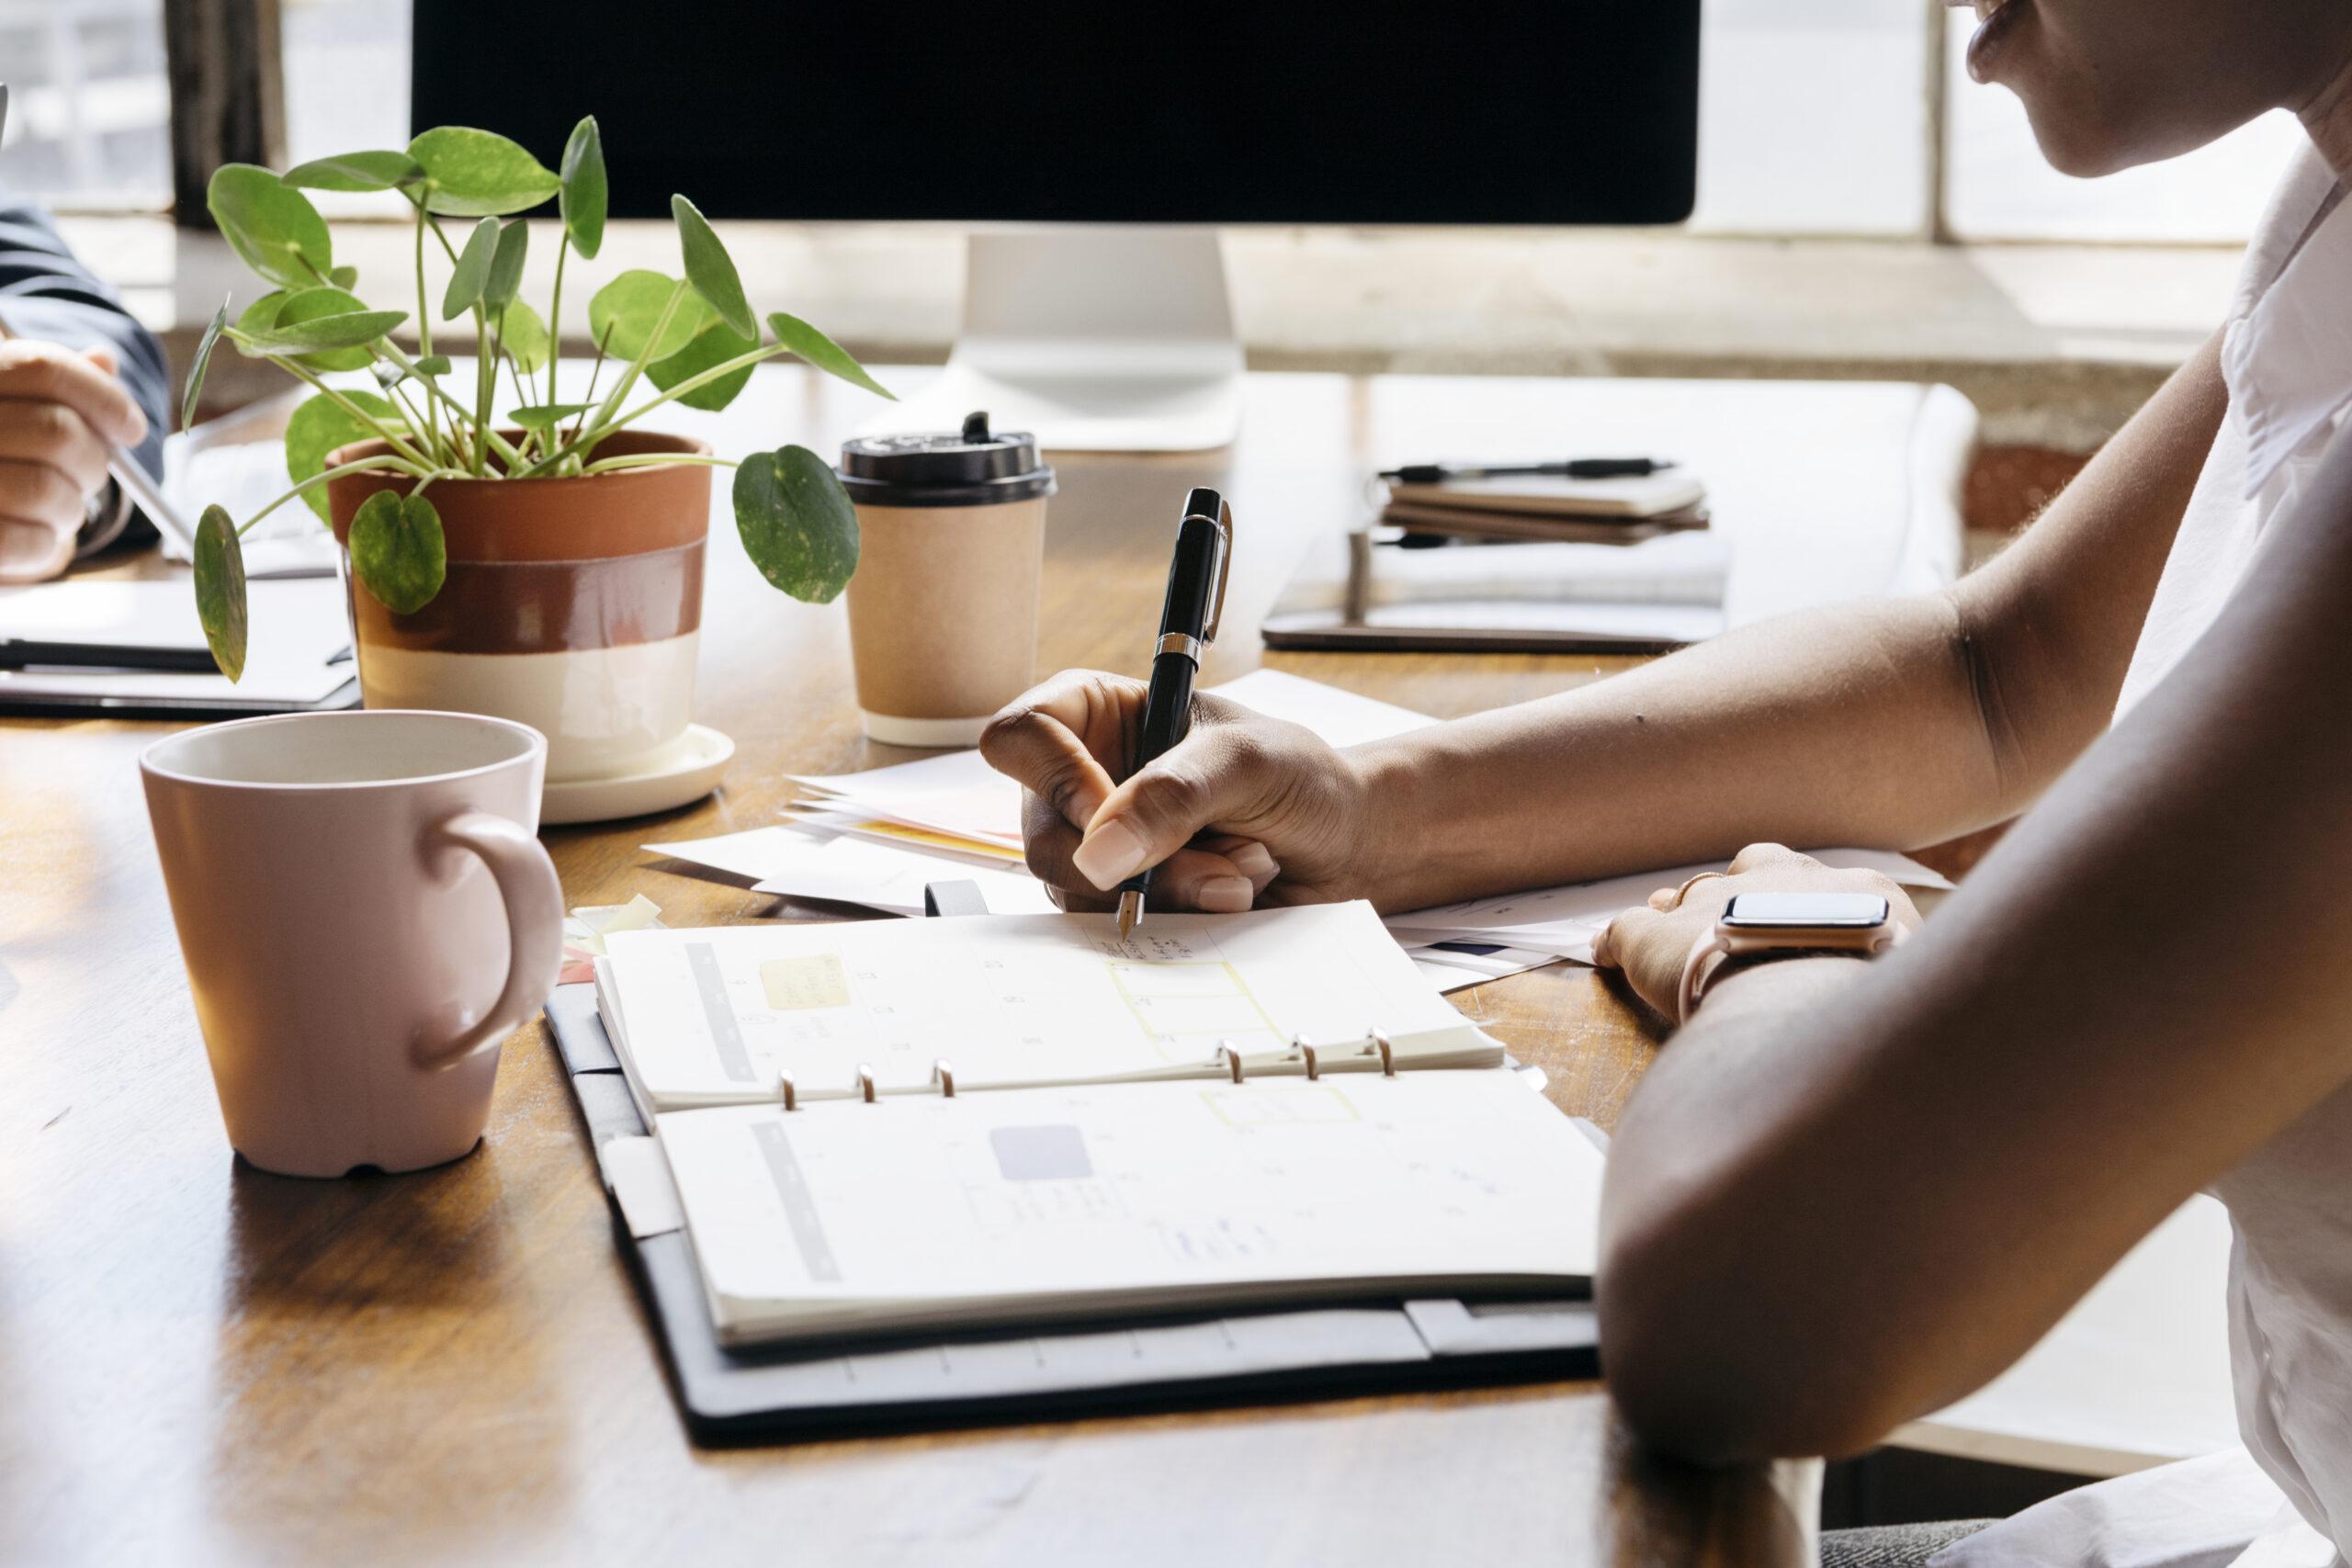 Businesswoman writing on personal organizer schedule